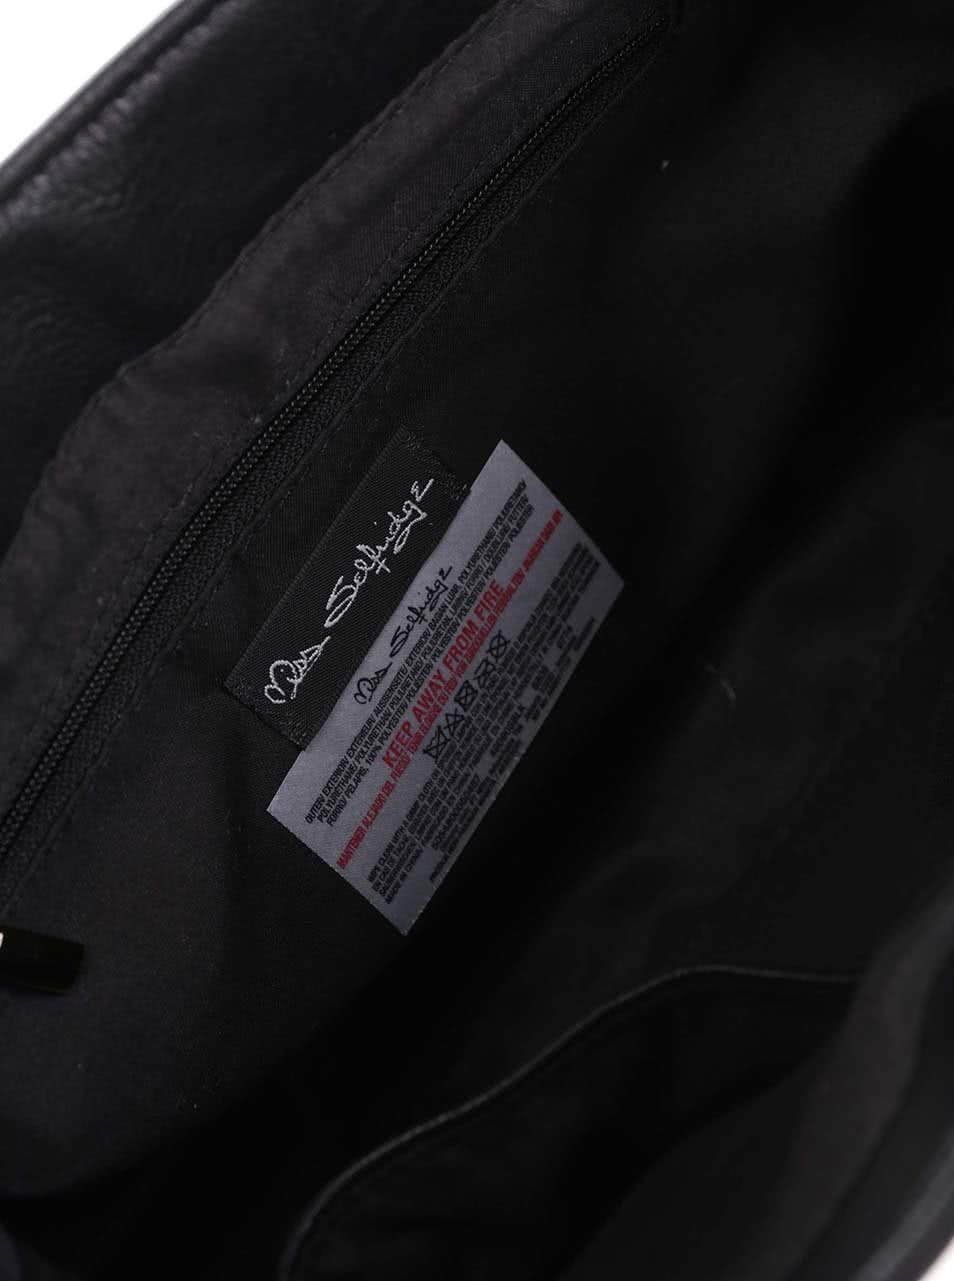 e90a6c28e6 Čierna crossbody kabelka s chlopňou v semišovej úprave Miss Selfridge ...